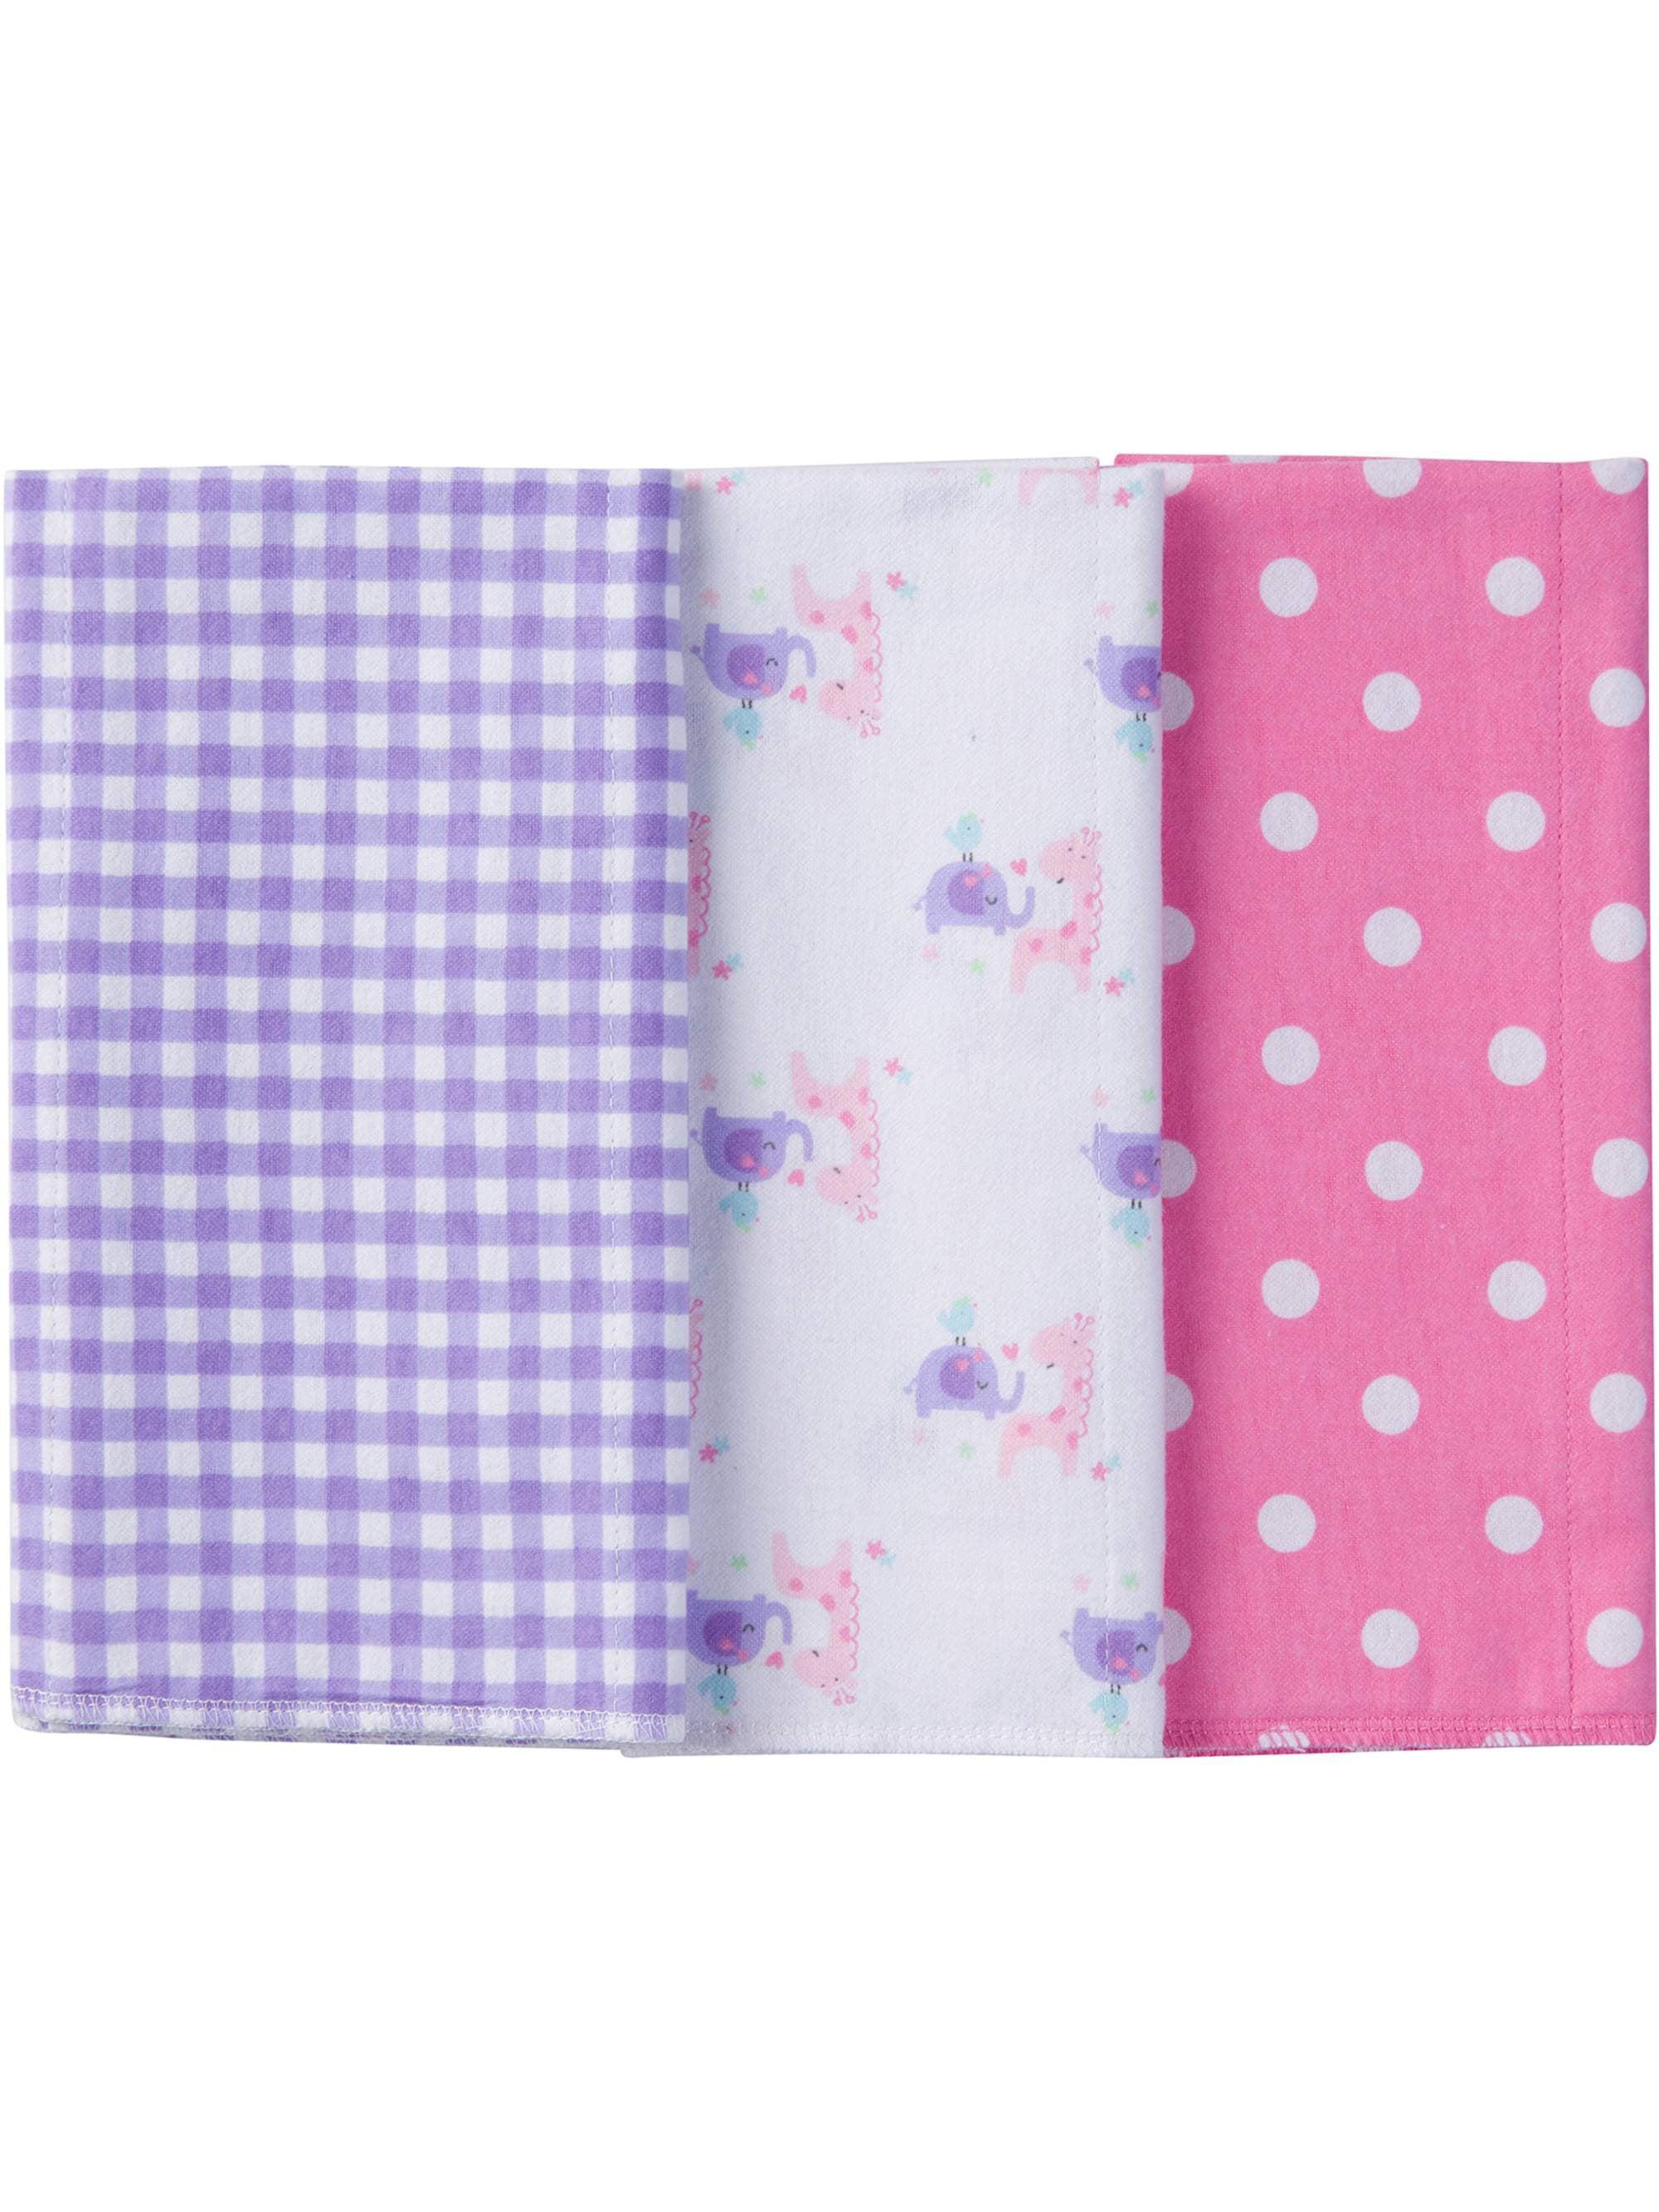 Gerber Newborn Baby Girl Assorted Flannel Burp Cloths, 3-Pack